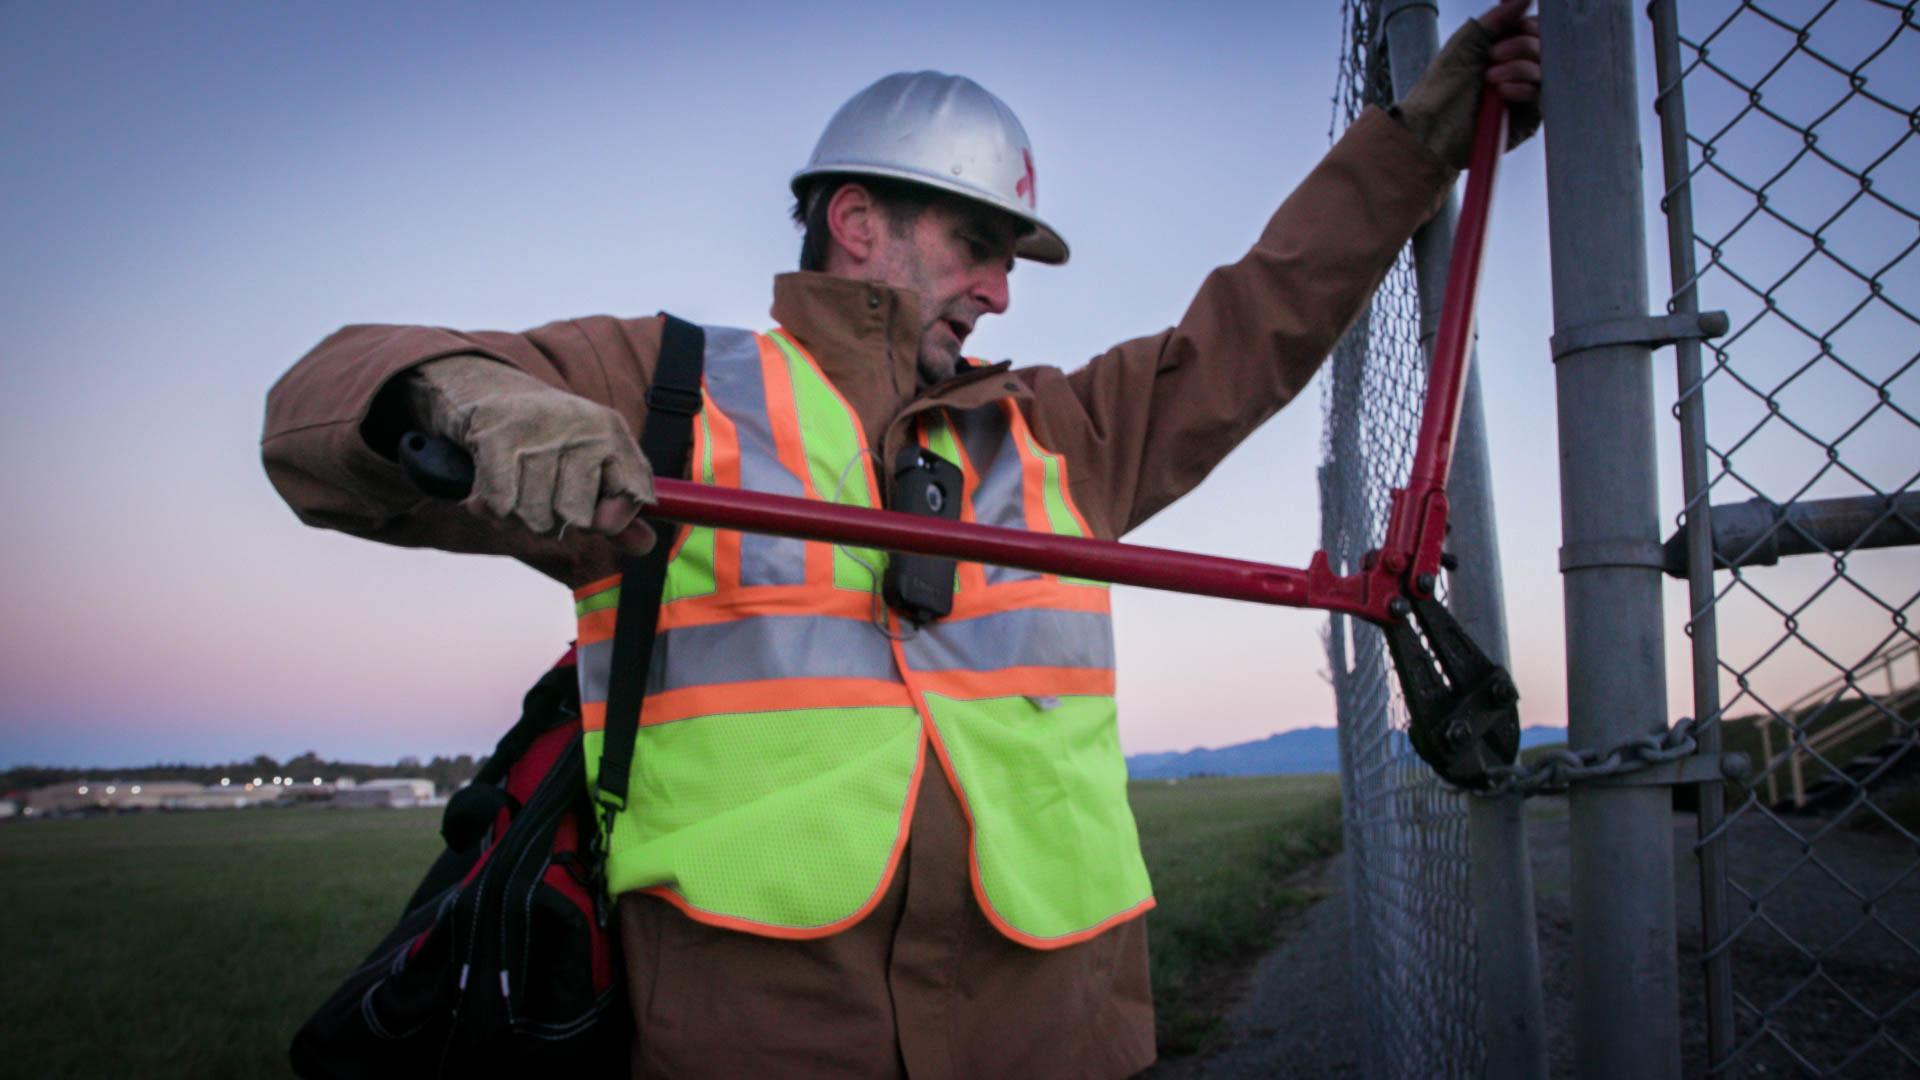 Ken Ward breaks into the TransMountain Pipeline facility October 11, 2016.